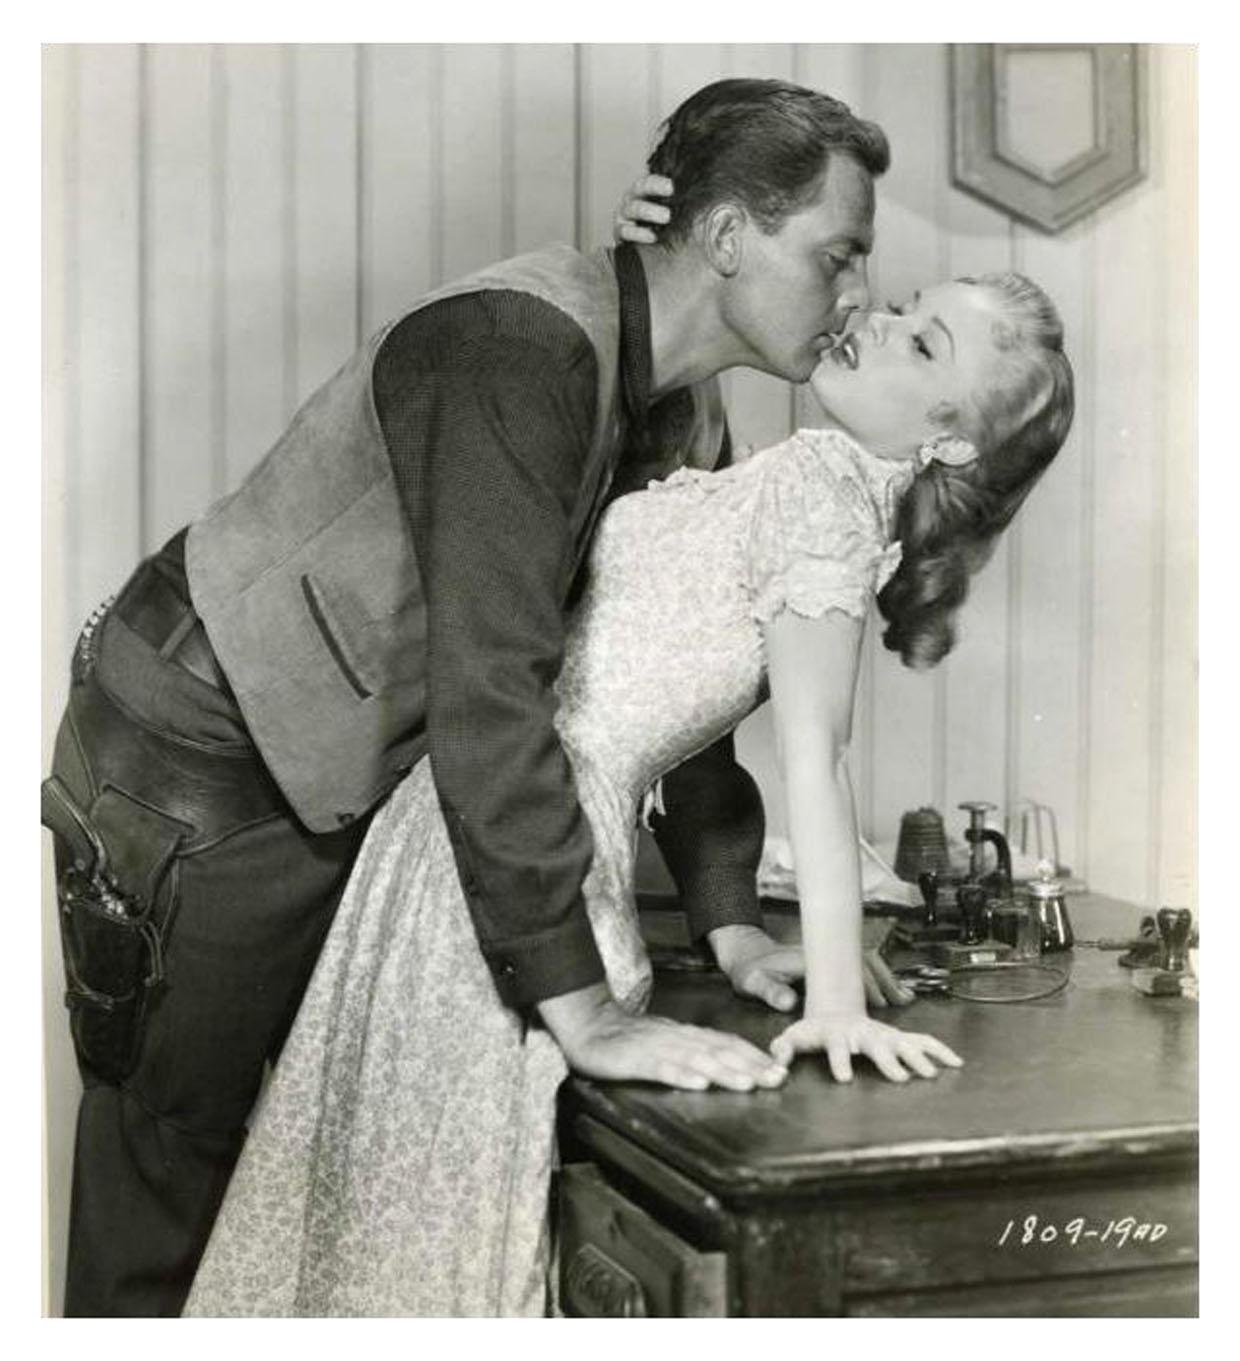 John Agar and Mamie Van Doren in Star in the Dust (1956)